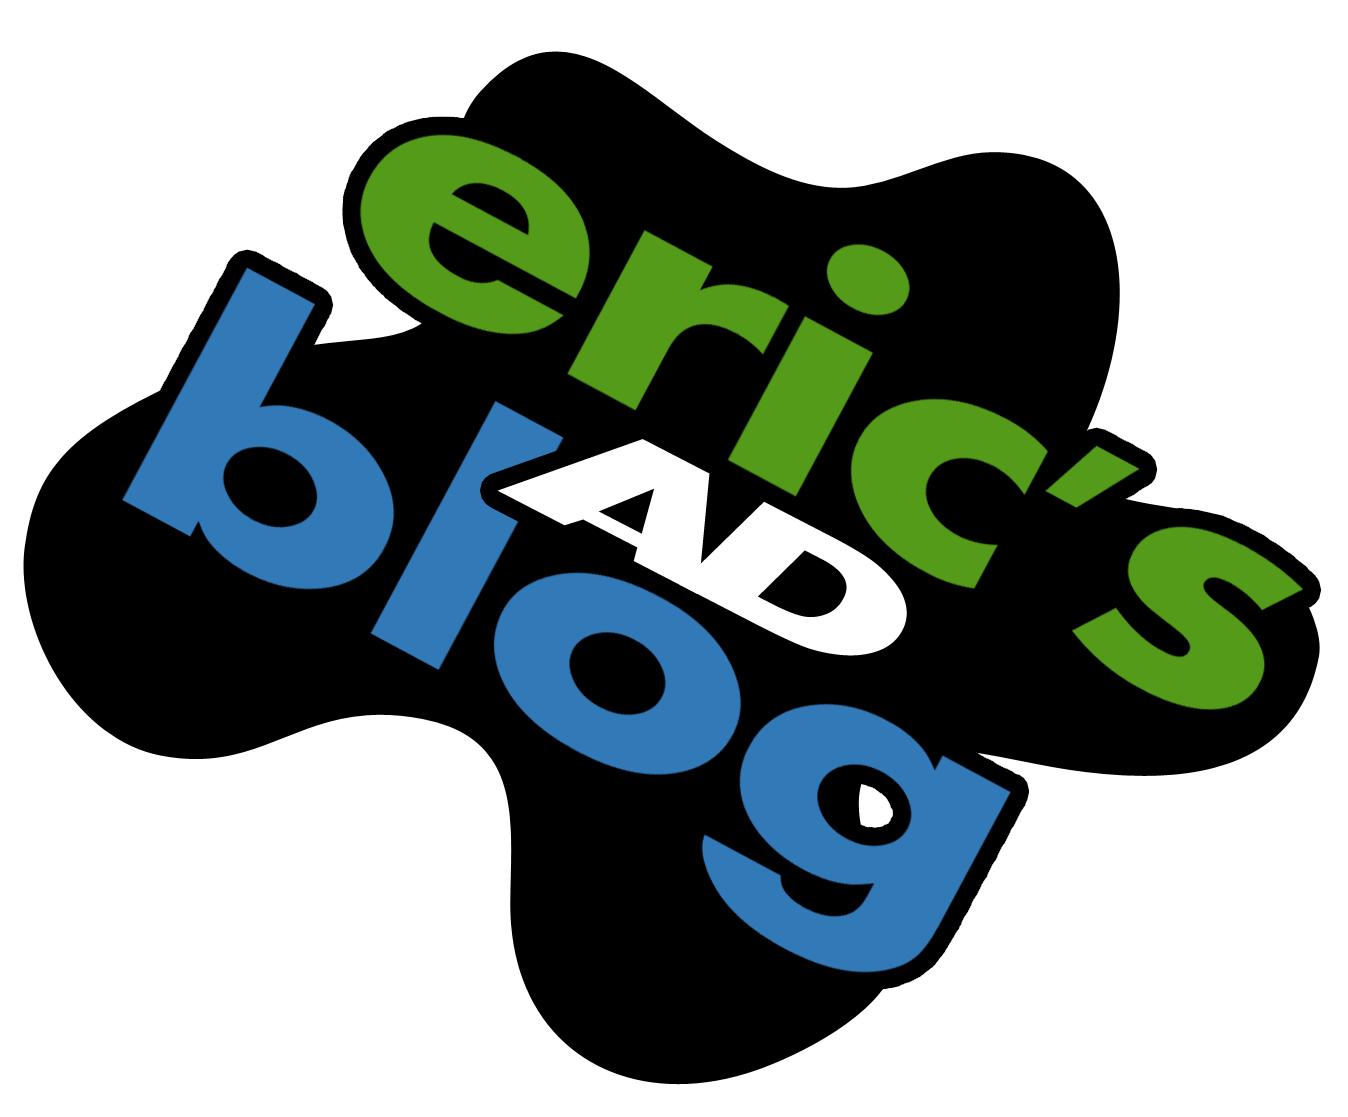 Eric Zimmett | ericsadblog.com